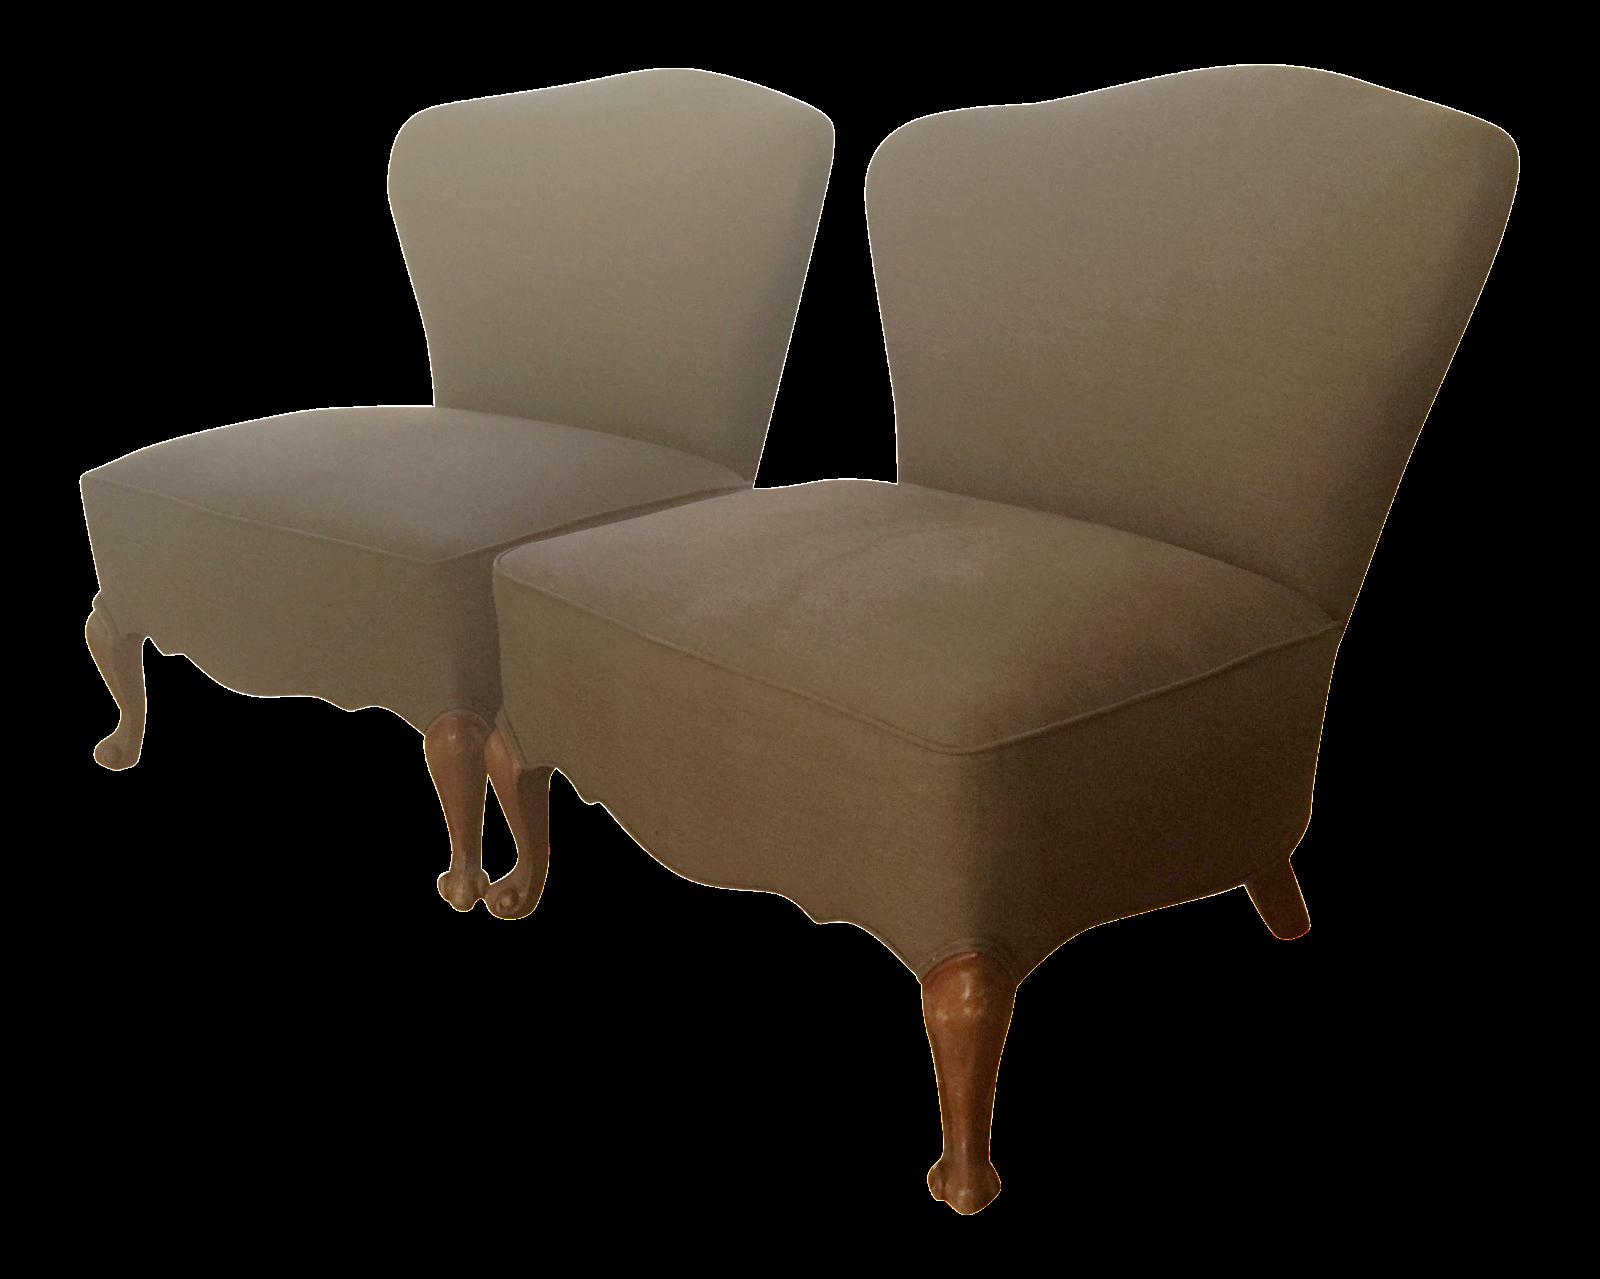 Vintage Slipper Chairs A Pair